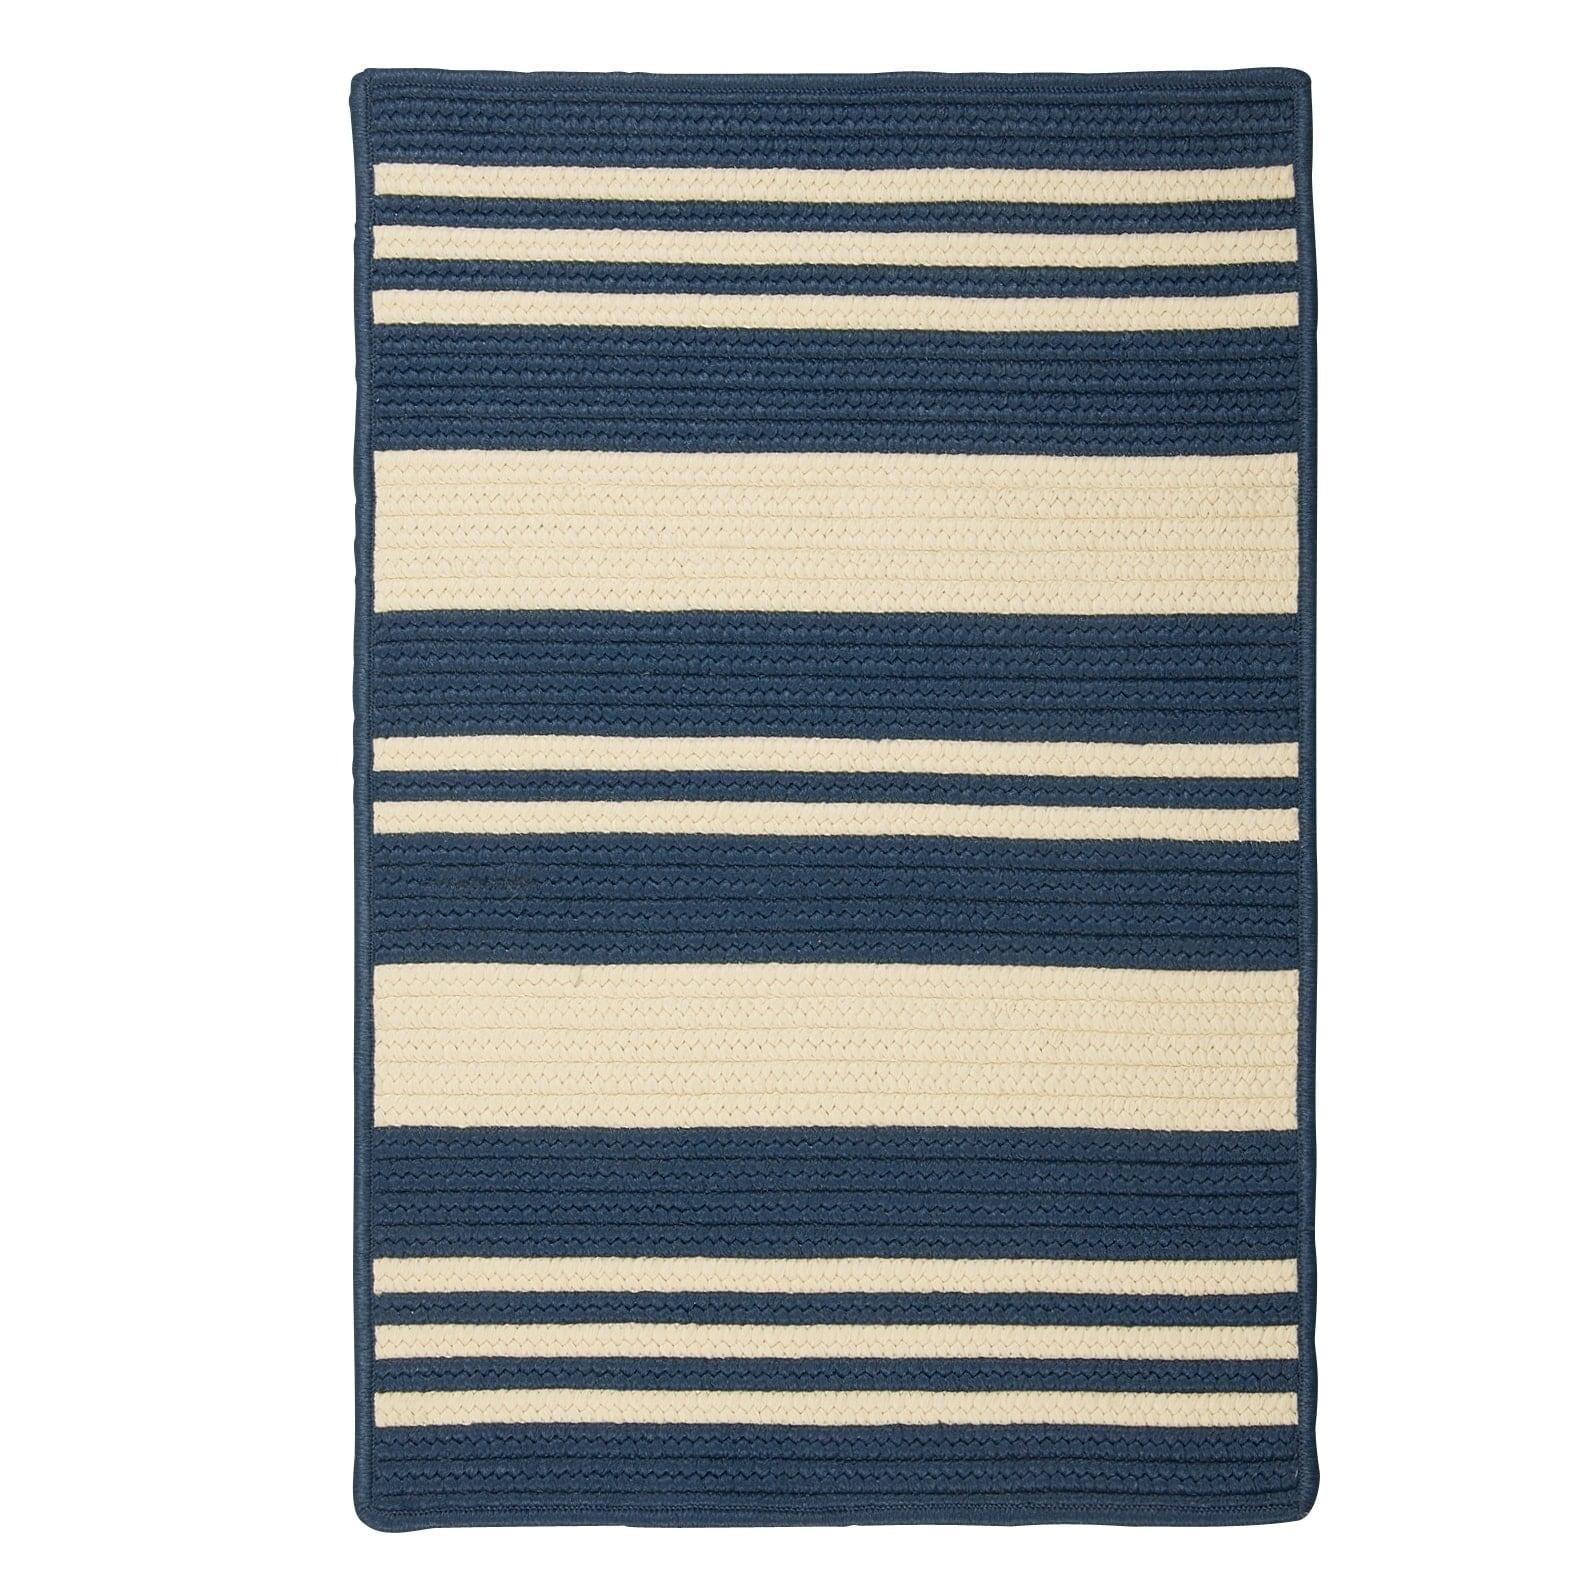 Colonial Mills Radiance Blue Jasmine Rug (7' x 7') (Blue)...